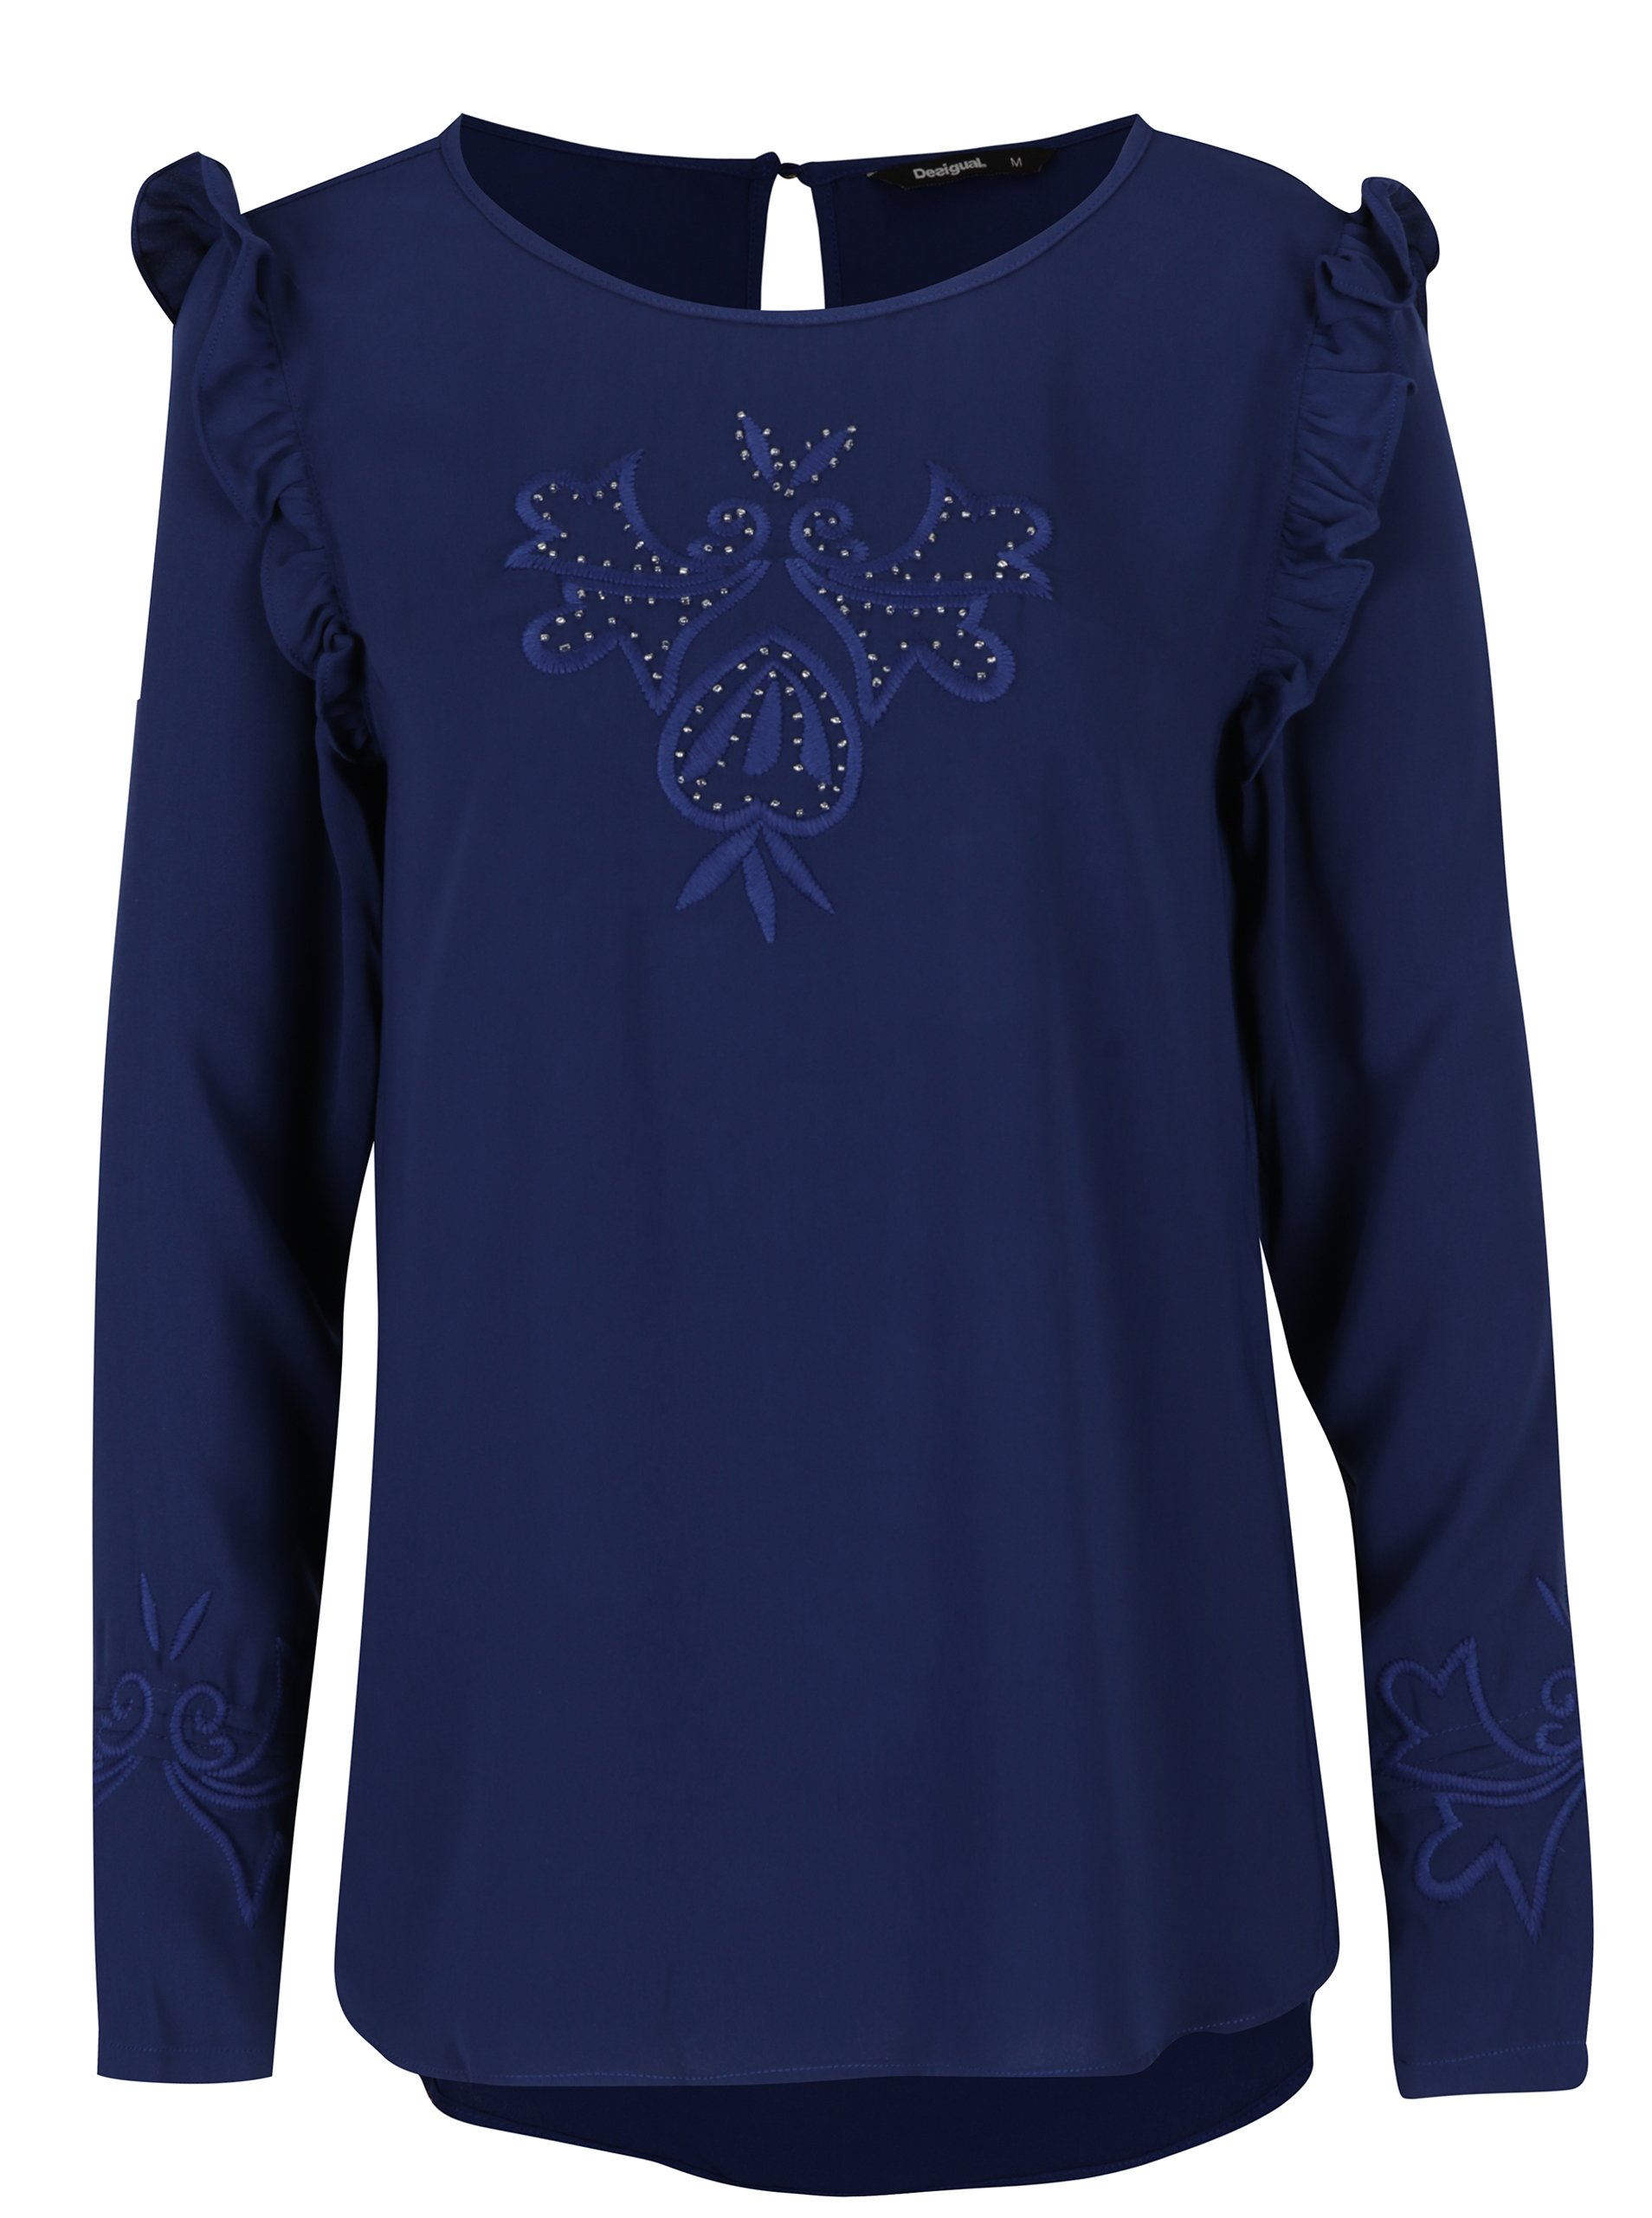 Modrá blúzka s výšivkami a volánmi Desigual Mimosa  70139dc377